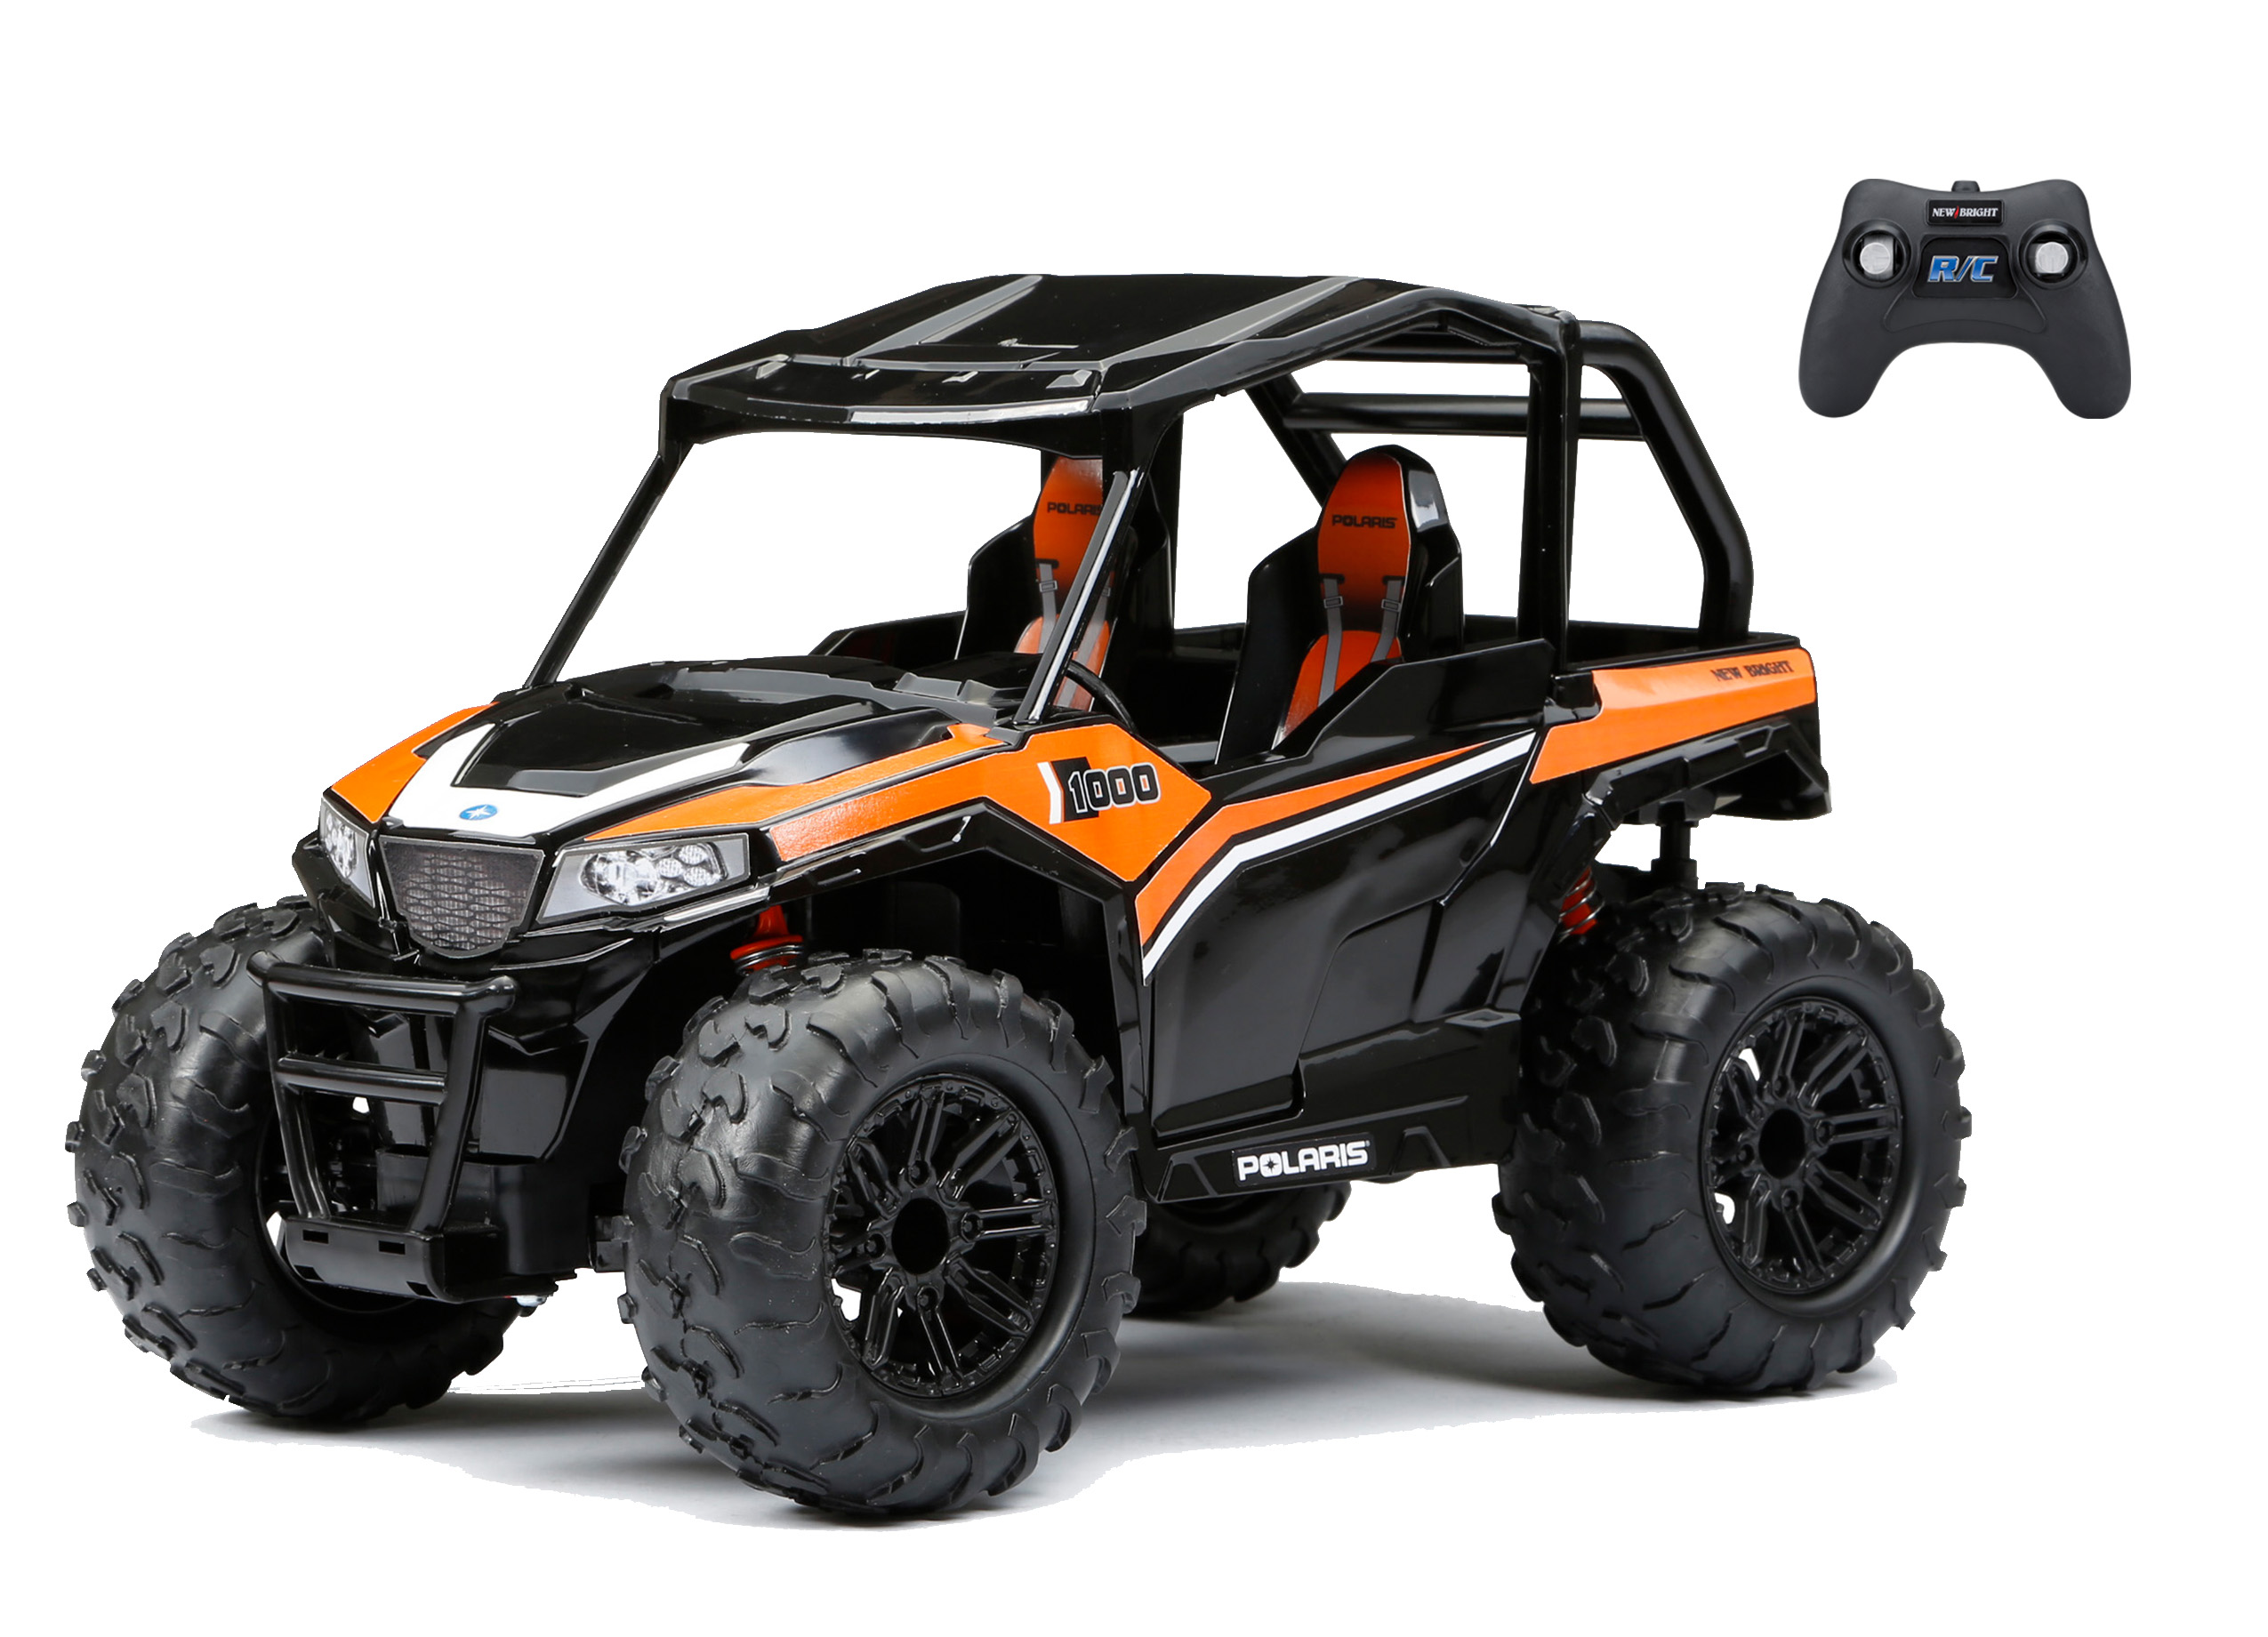 New Bright 1:14 Radio Control Polaris® General™ ATV - Orange - Walmart.com